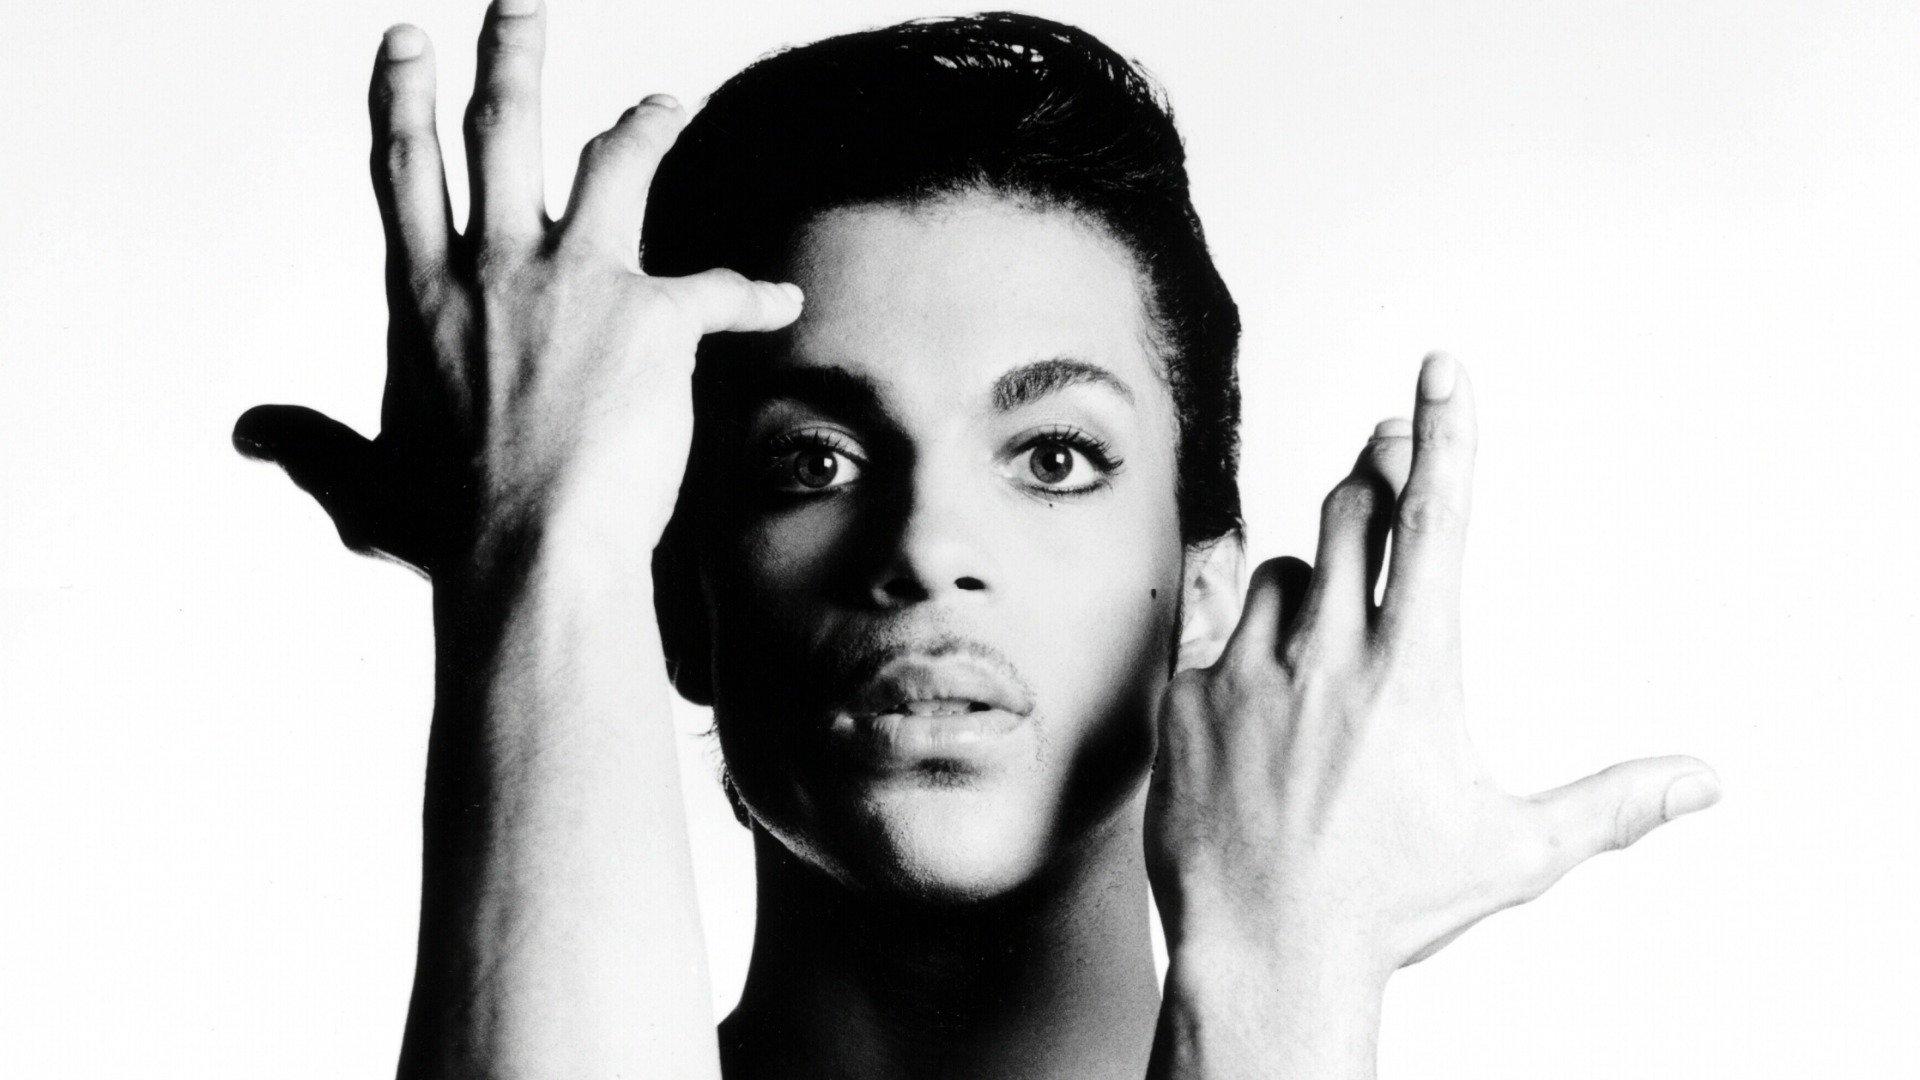 Happy birthday Prince